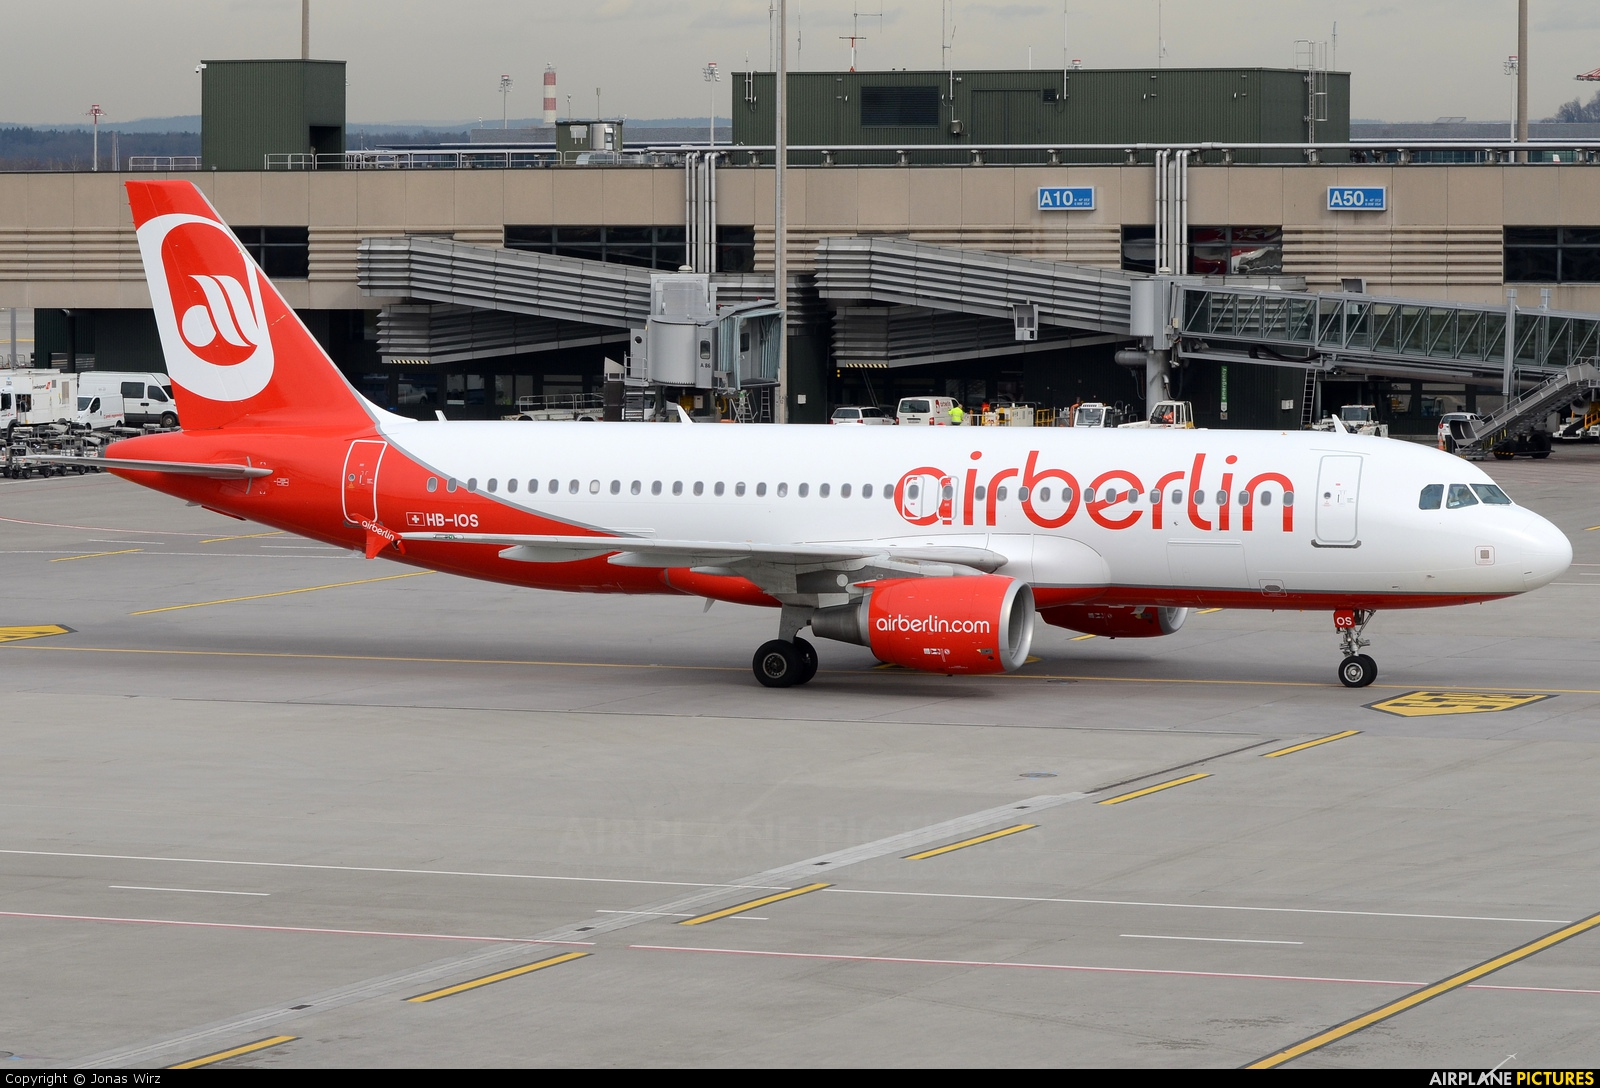 Air Berlin - Belair HB-IOS aircraft at Zurich